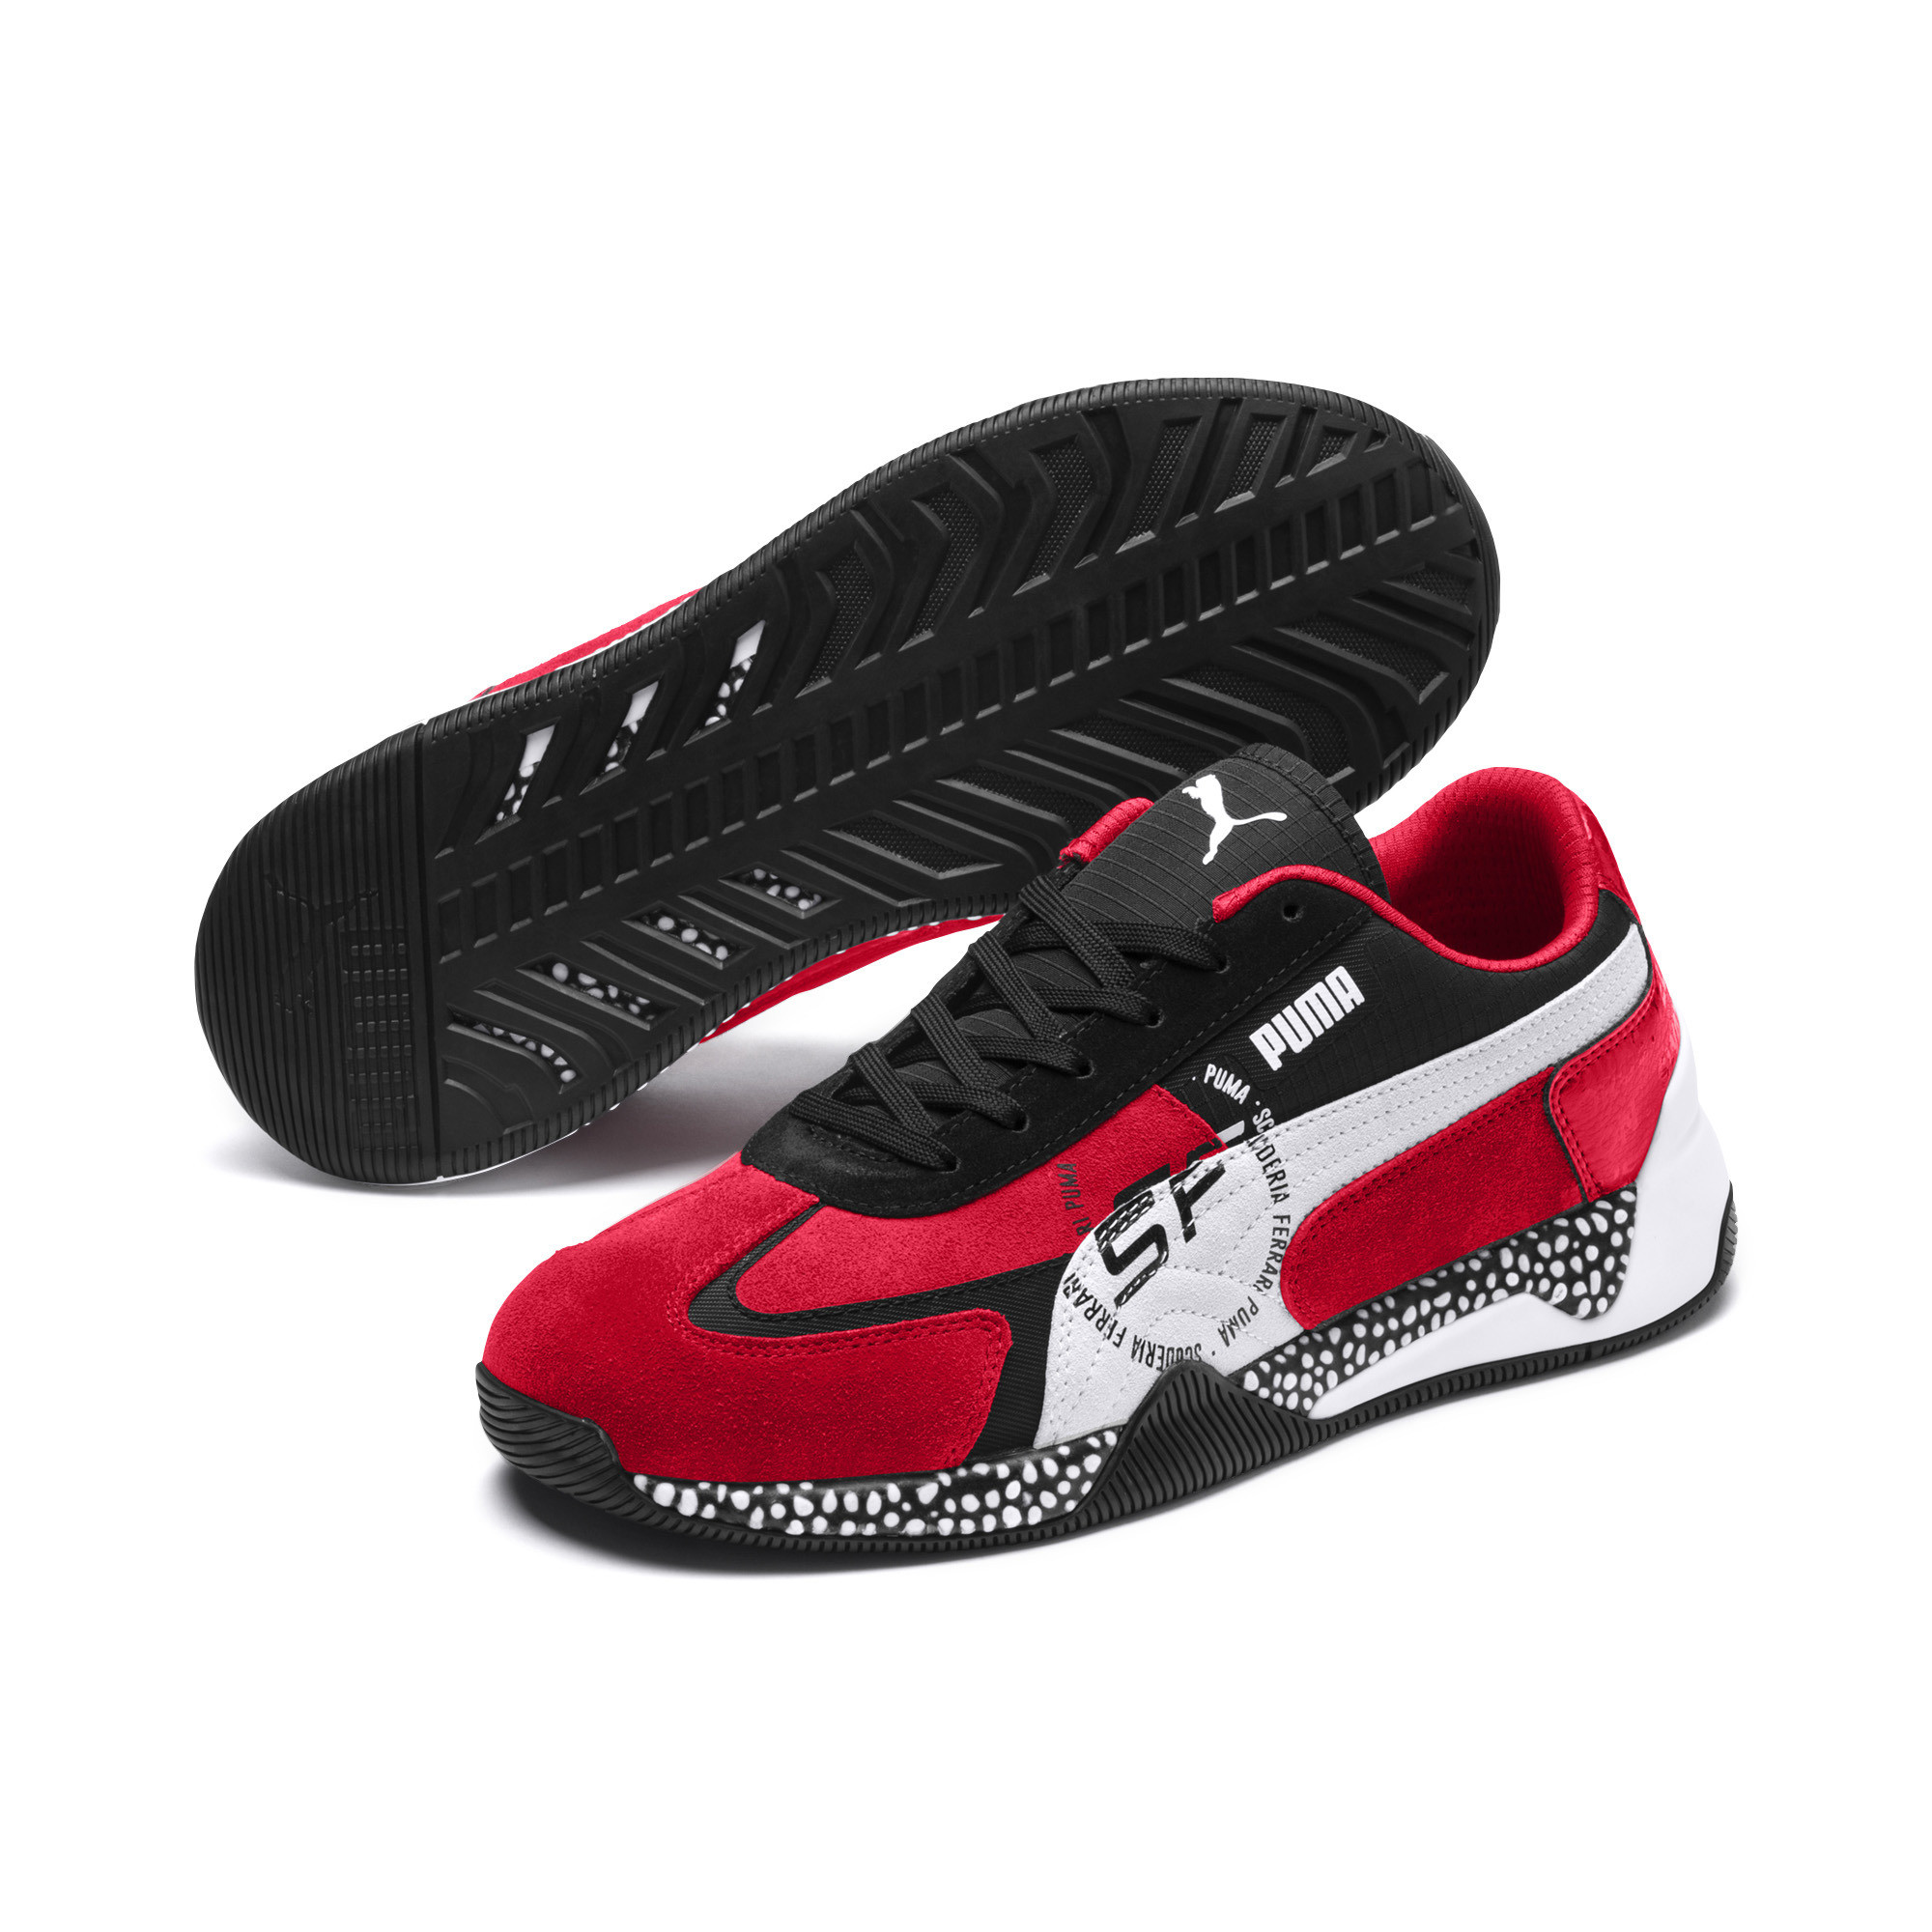 Details zu Puma Sf Kart Cat III Rosso Herren Herrenschuhe Turnschuhe Rot Schuhe 306219 01